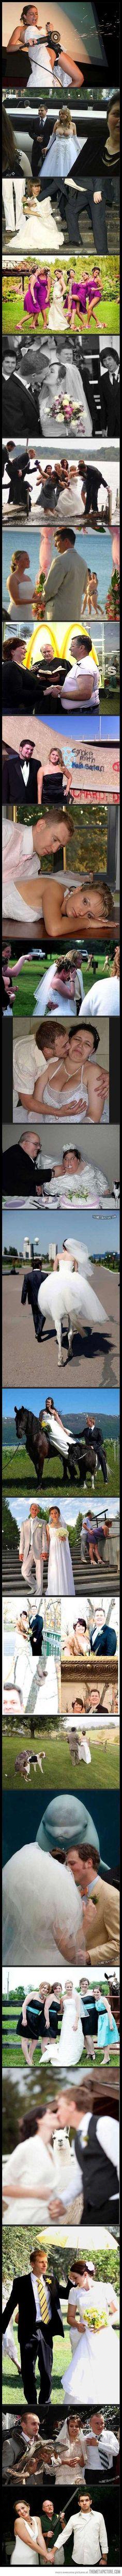 Awkward Wedding Pictures